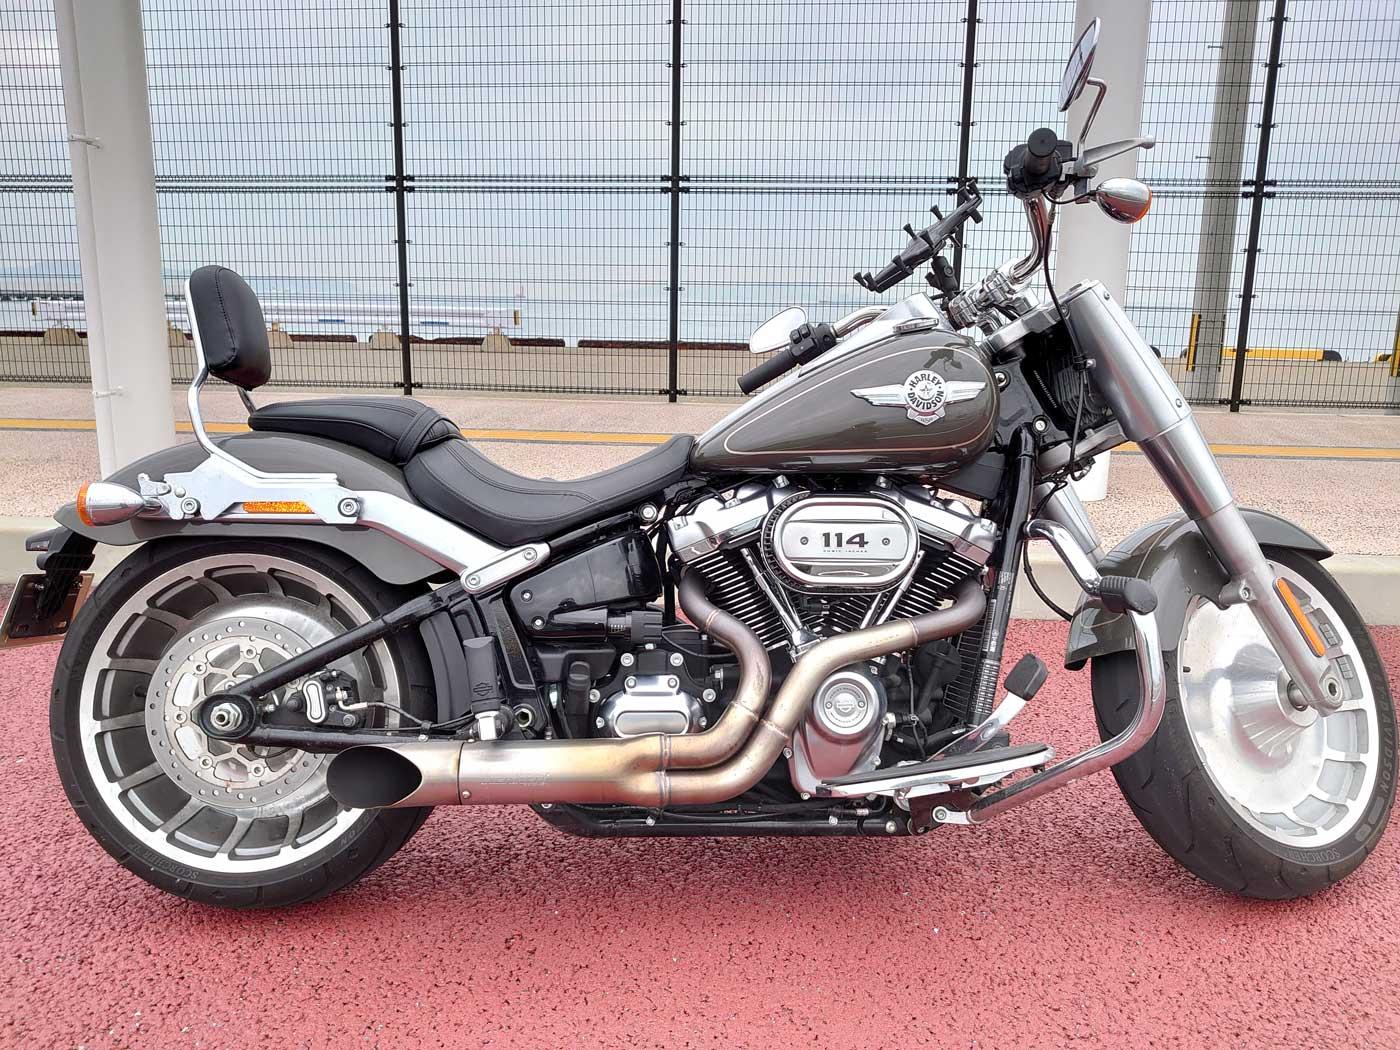 FLFBS ファットボーイ(SH-203) - 【公式】レンタルバイクのベストBike® 香椎駅前